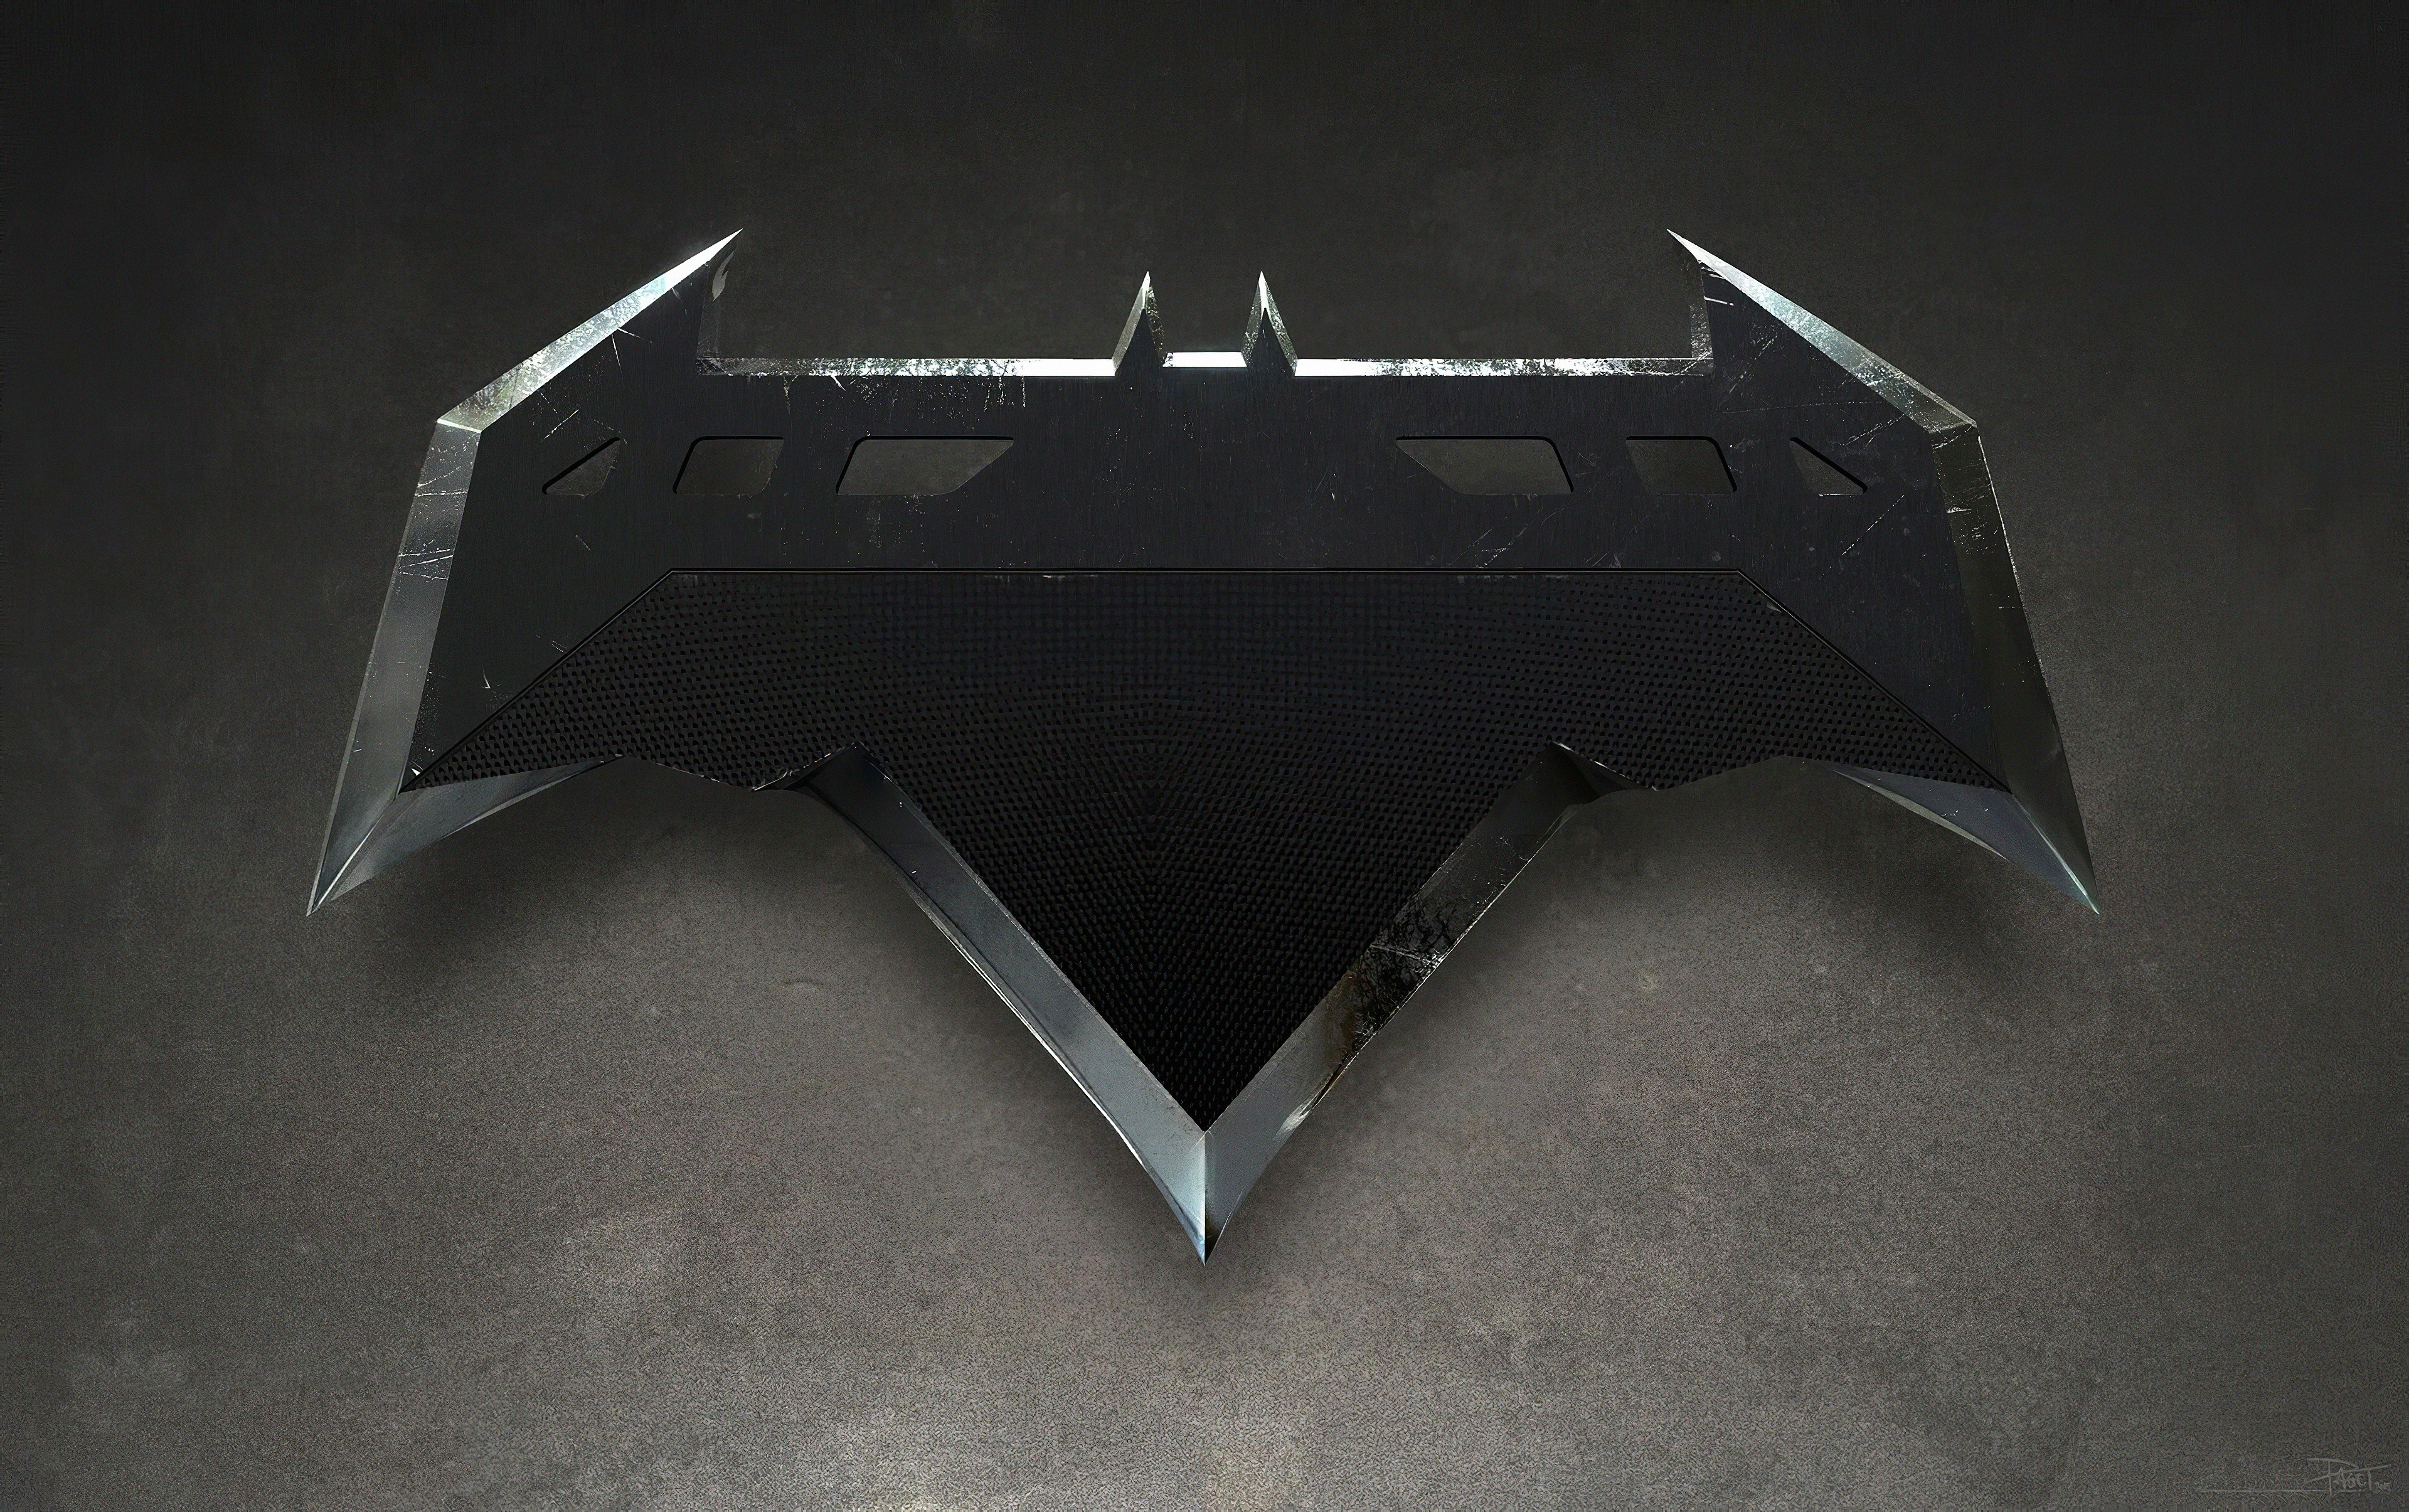 the batman logo 1580588595 - The Batman Logo - The Batman Logo wallpapers, The Batman Logo phone wallpapers 4k, The Batman Logo 4k wallpapers